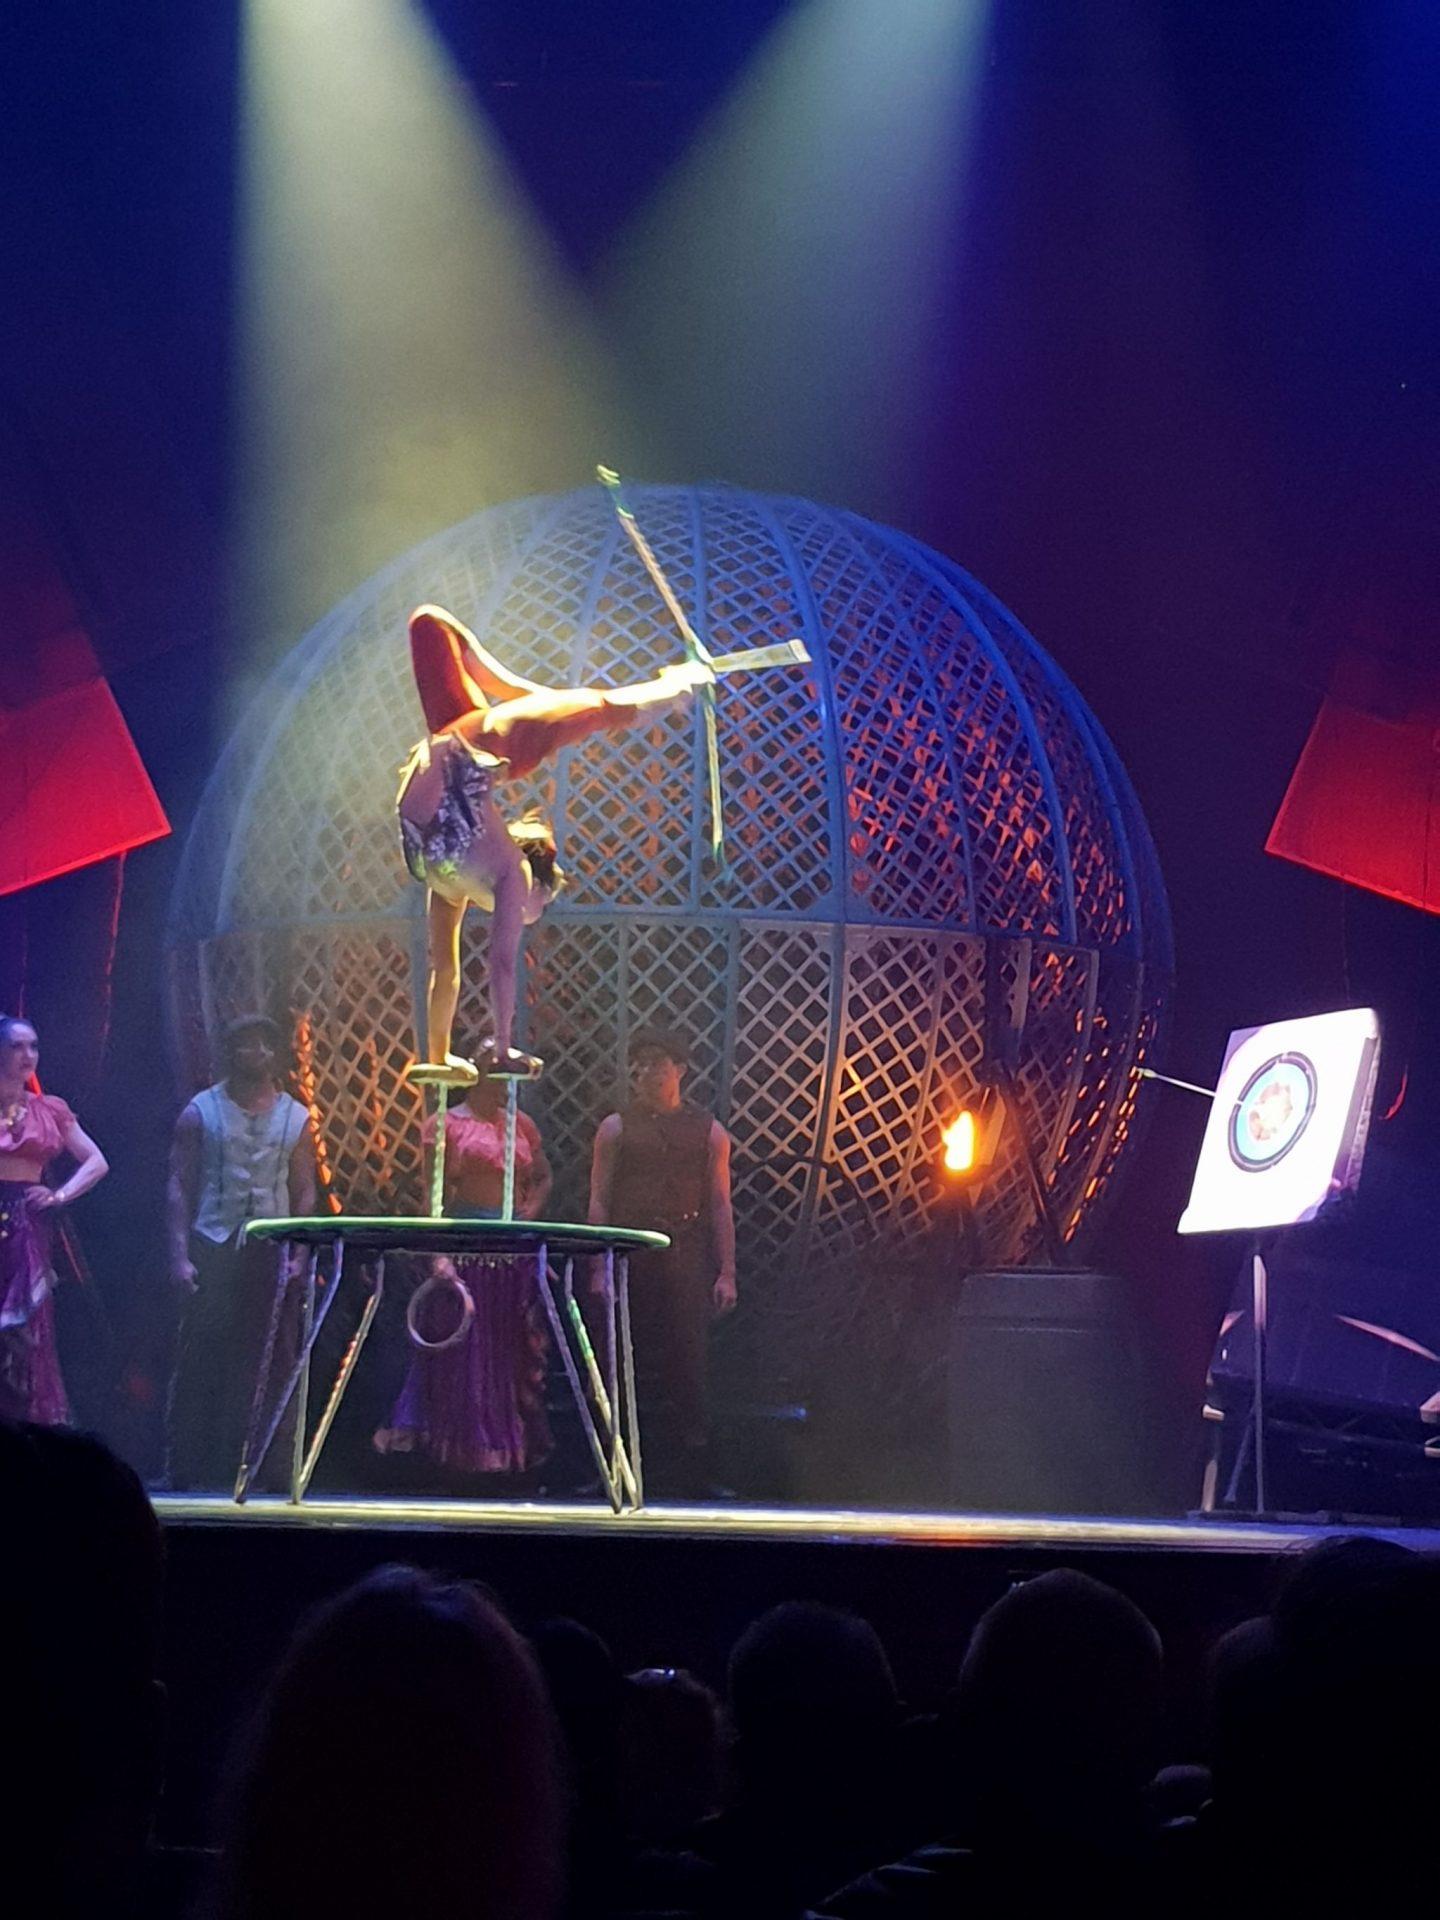 20180621 204909 1440x1920 - The Toon Has Gone Cirque Berserk!